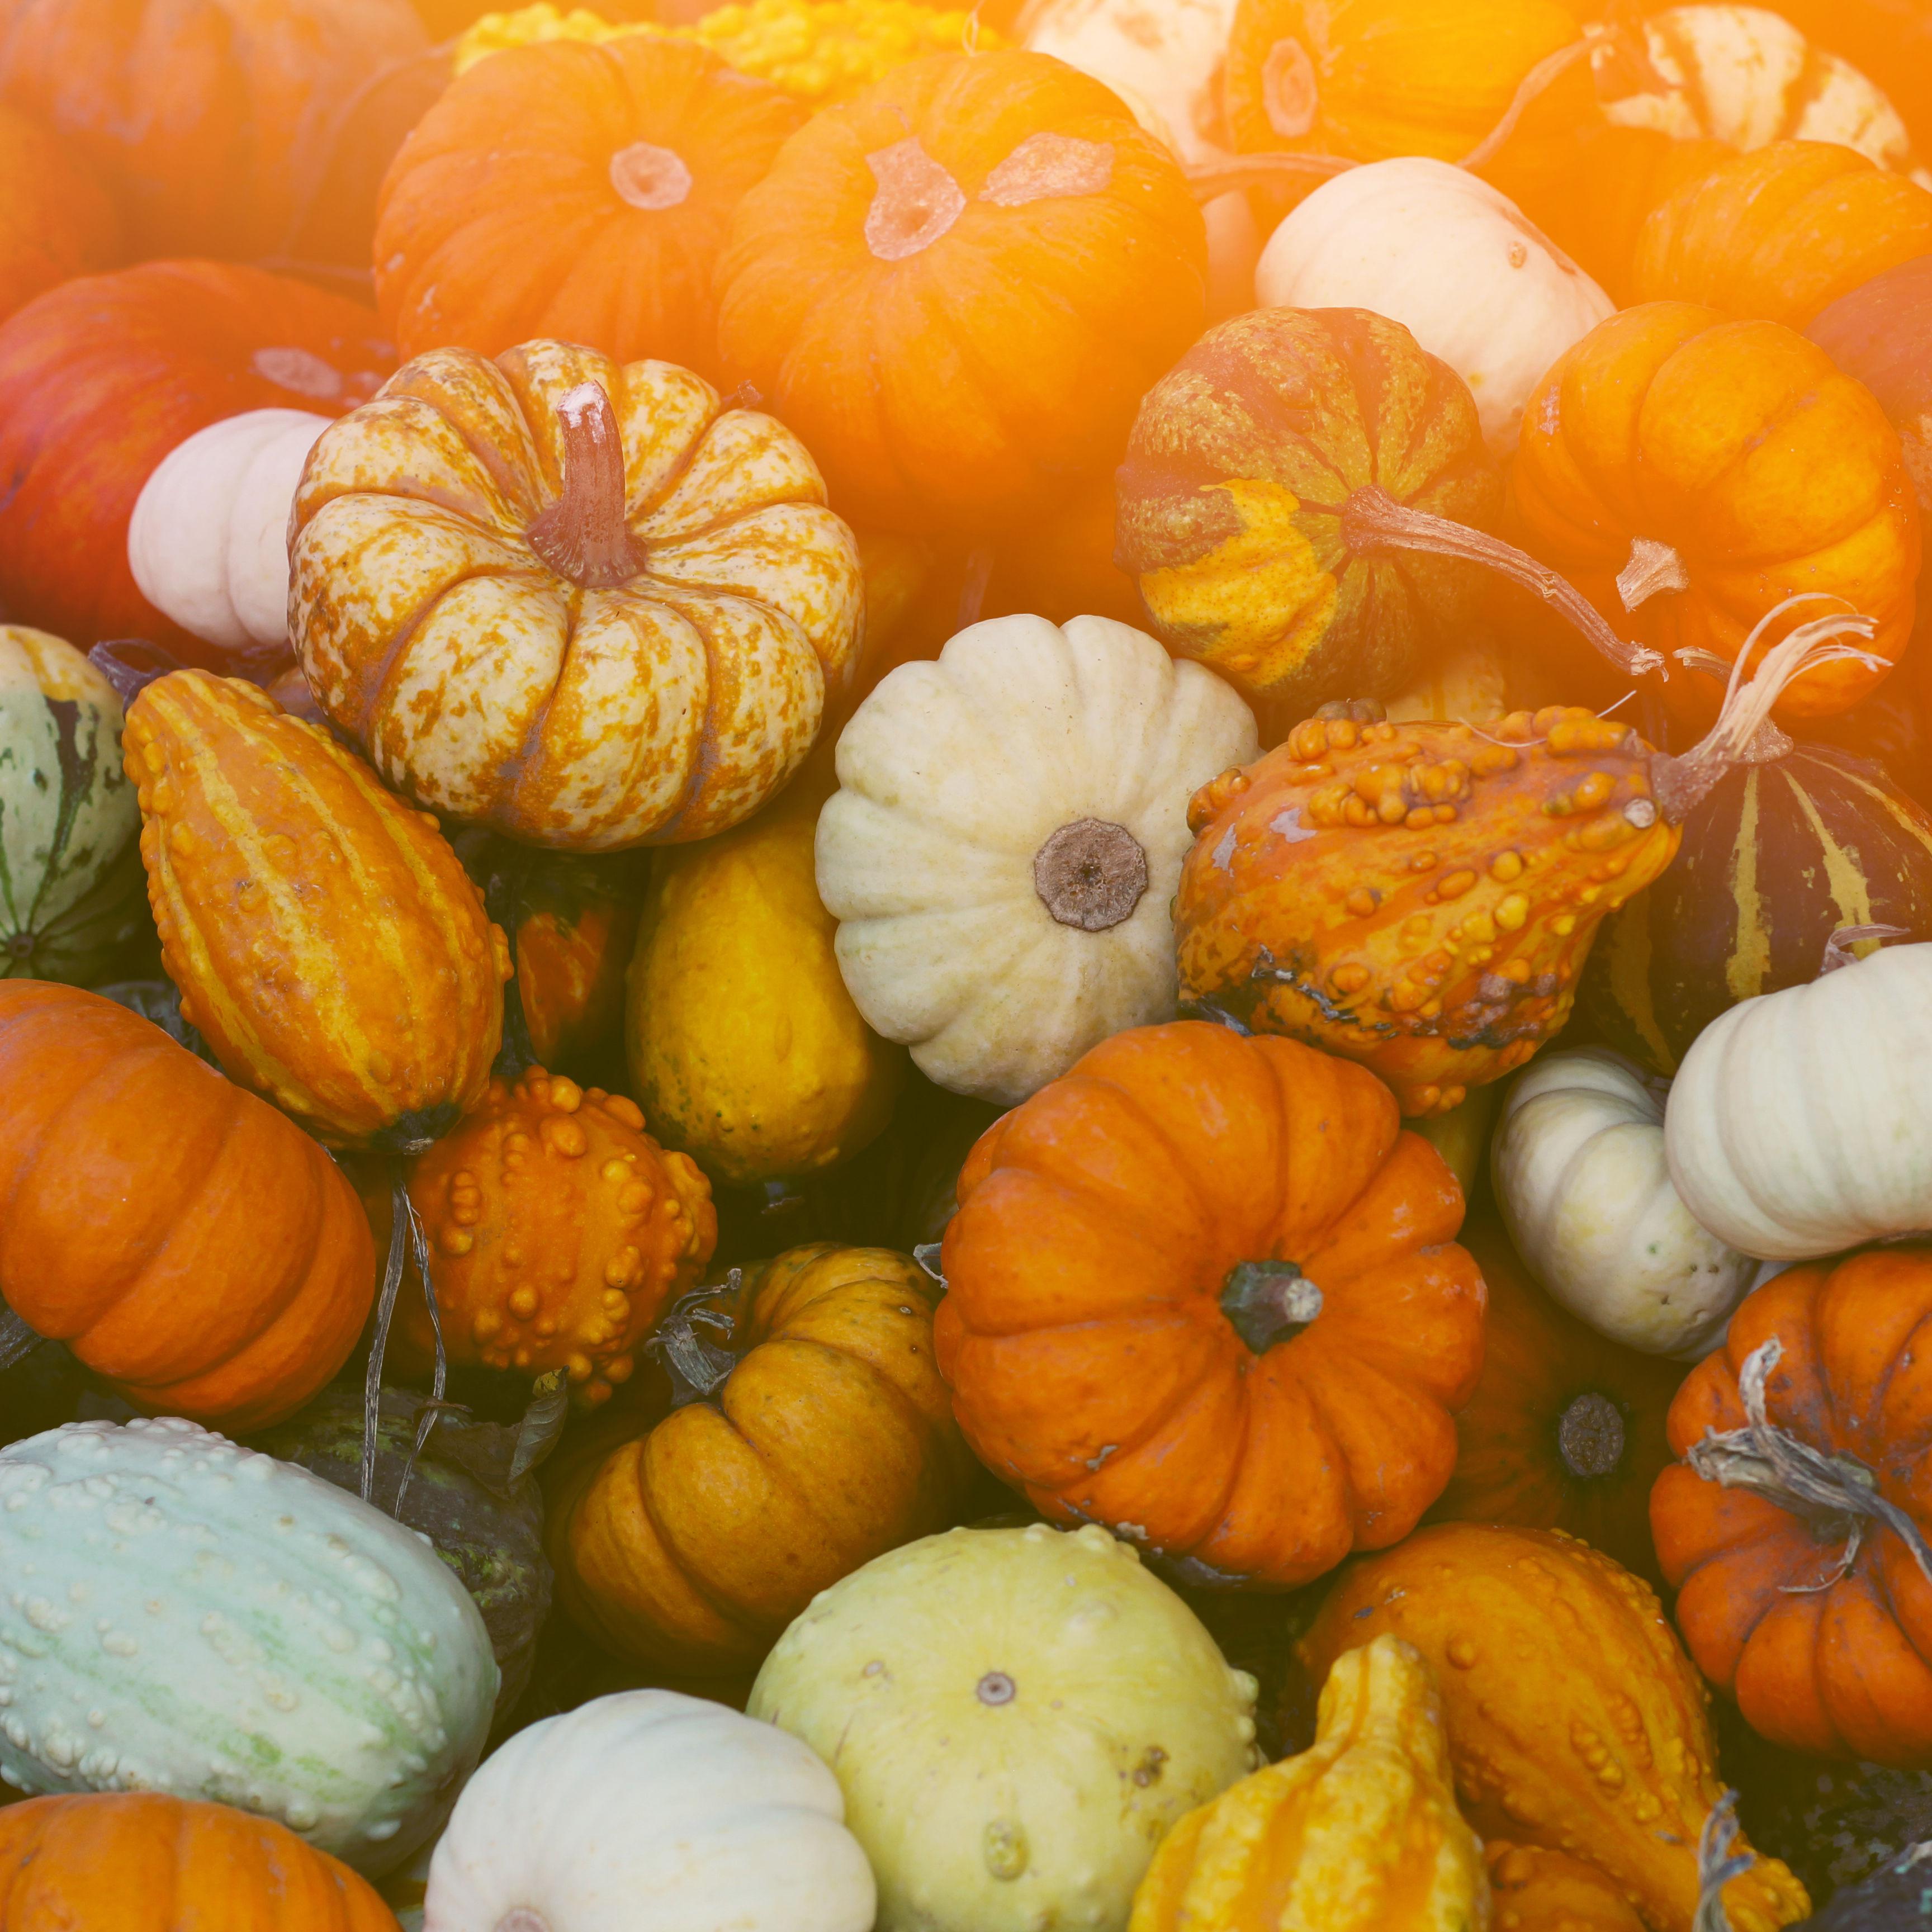 Pumpkins zdiz8o